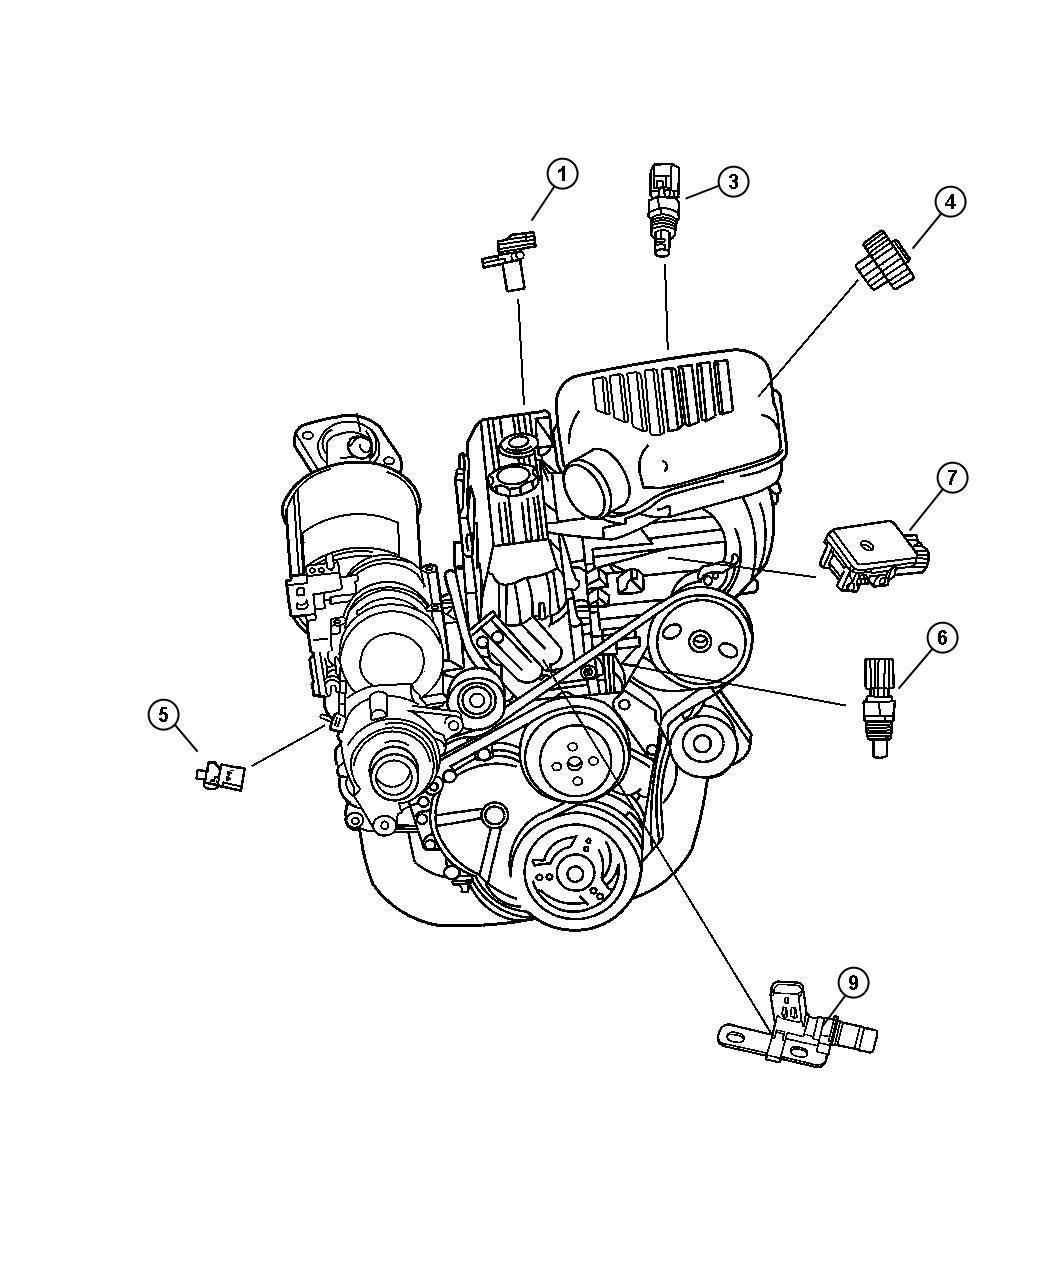 Jeep Wrangler Sensors 2 4l Engine All 4 Cyl Gas